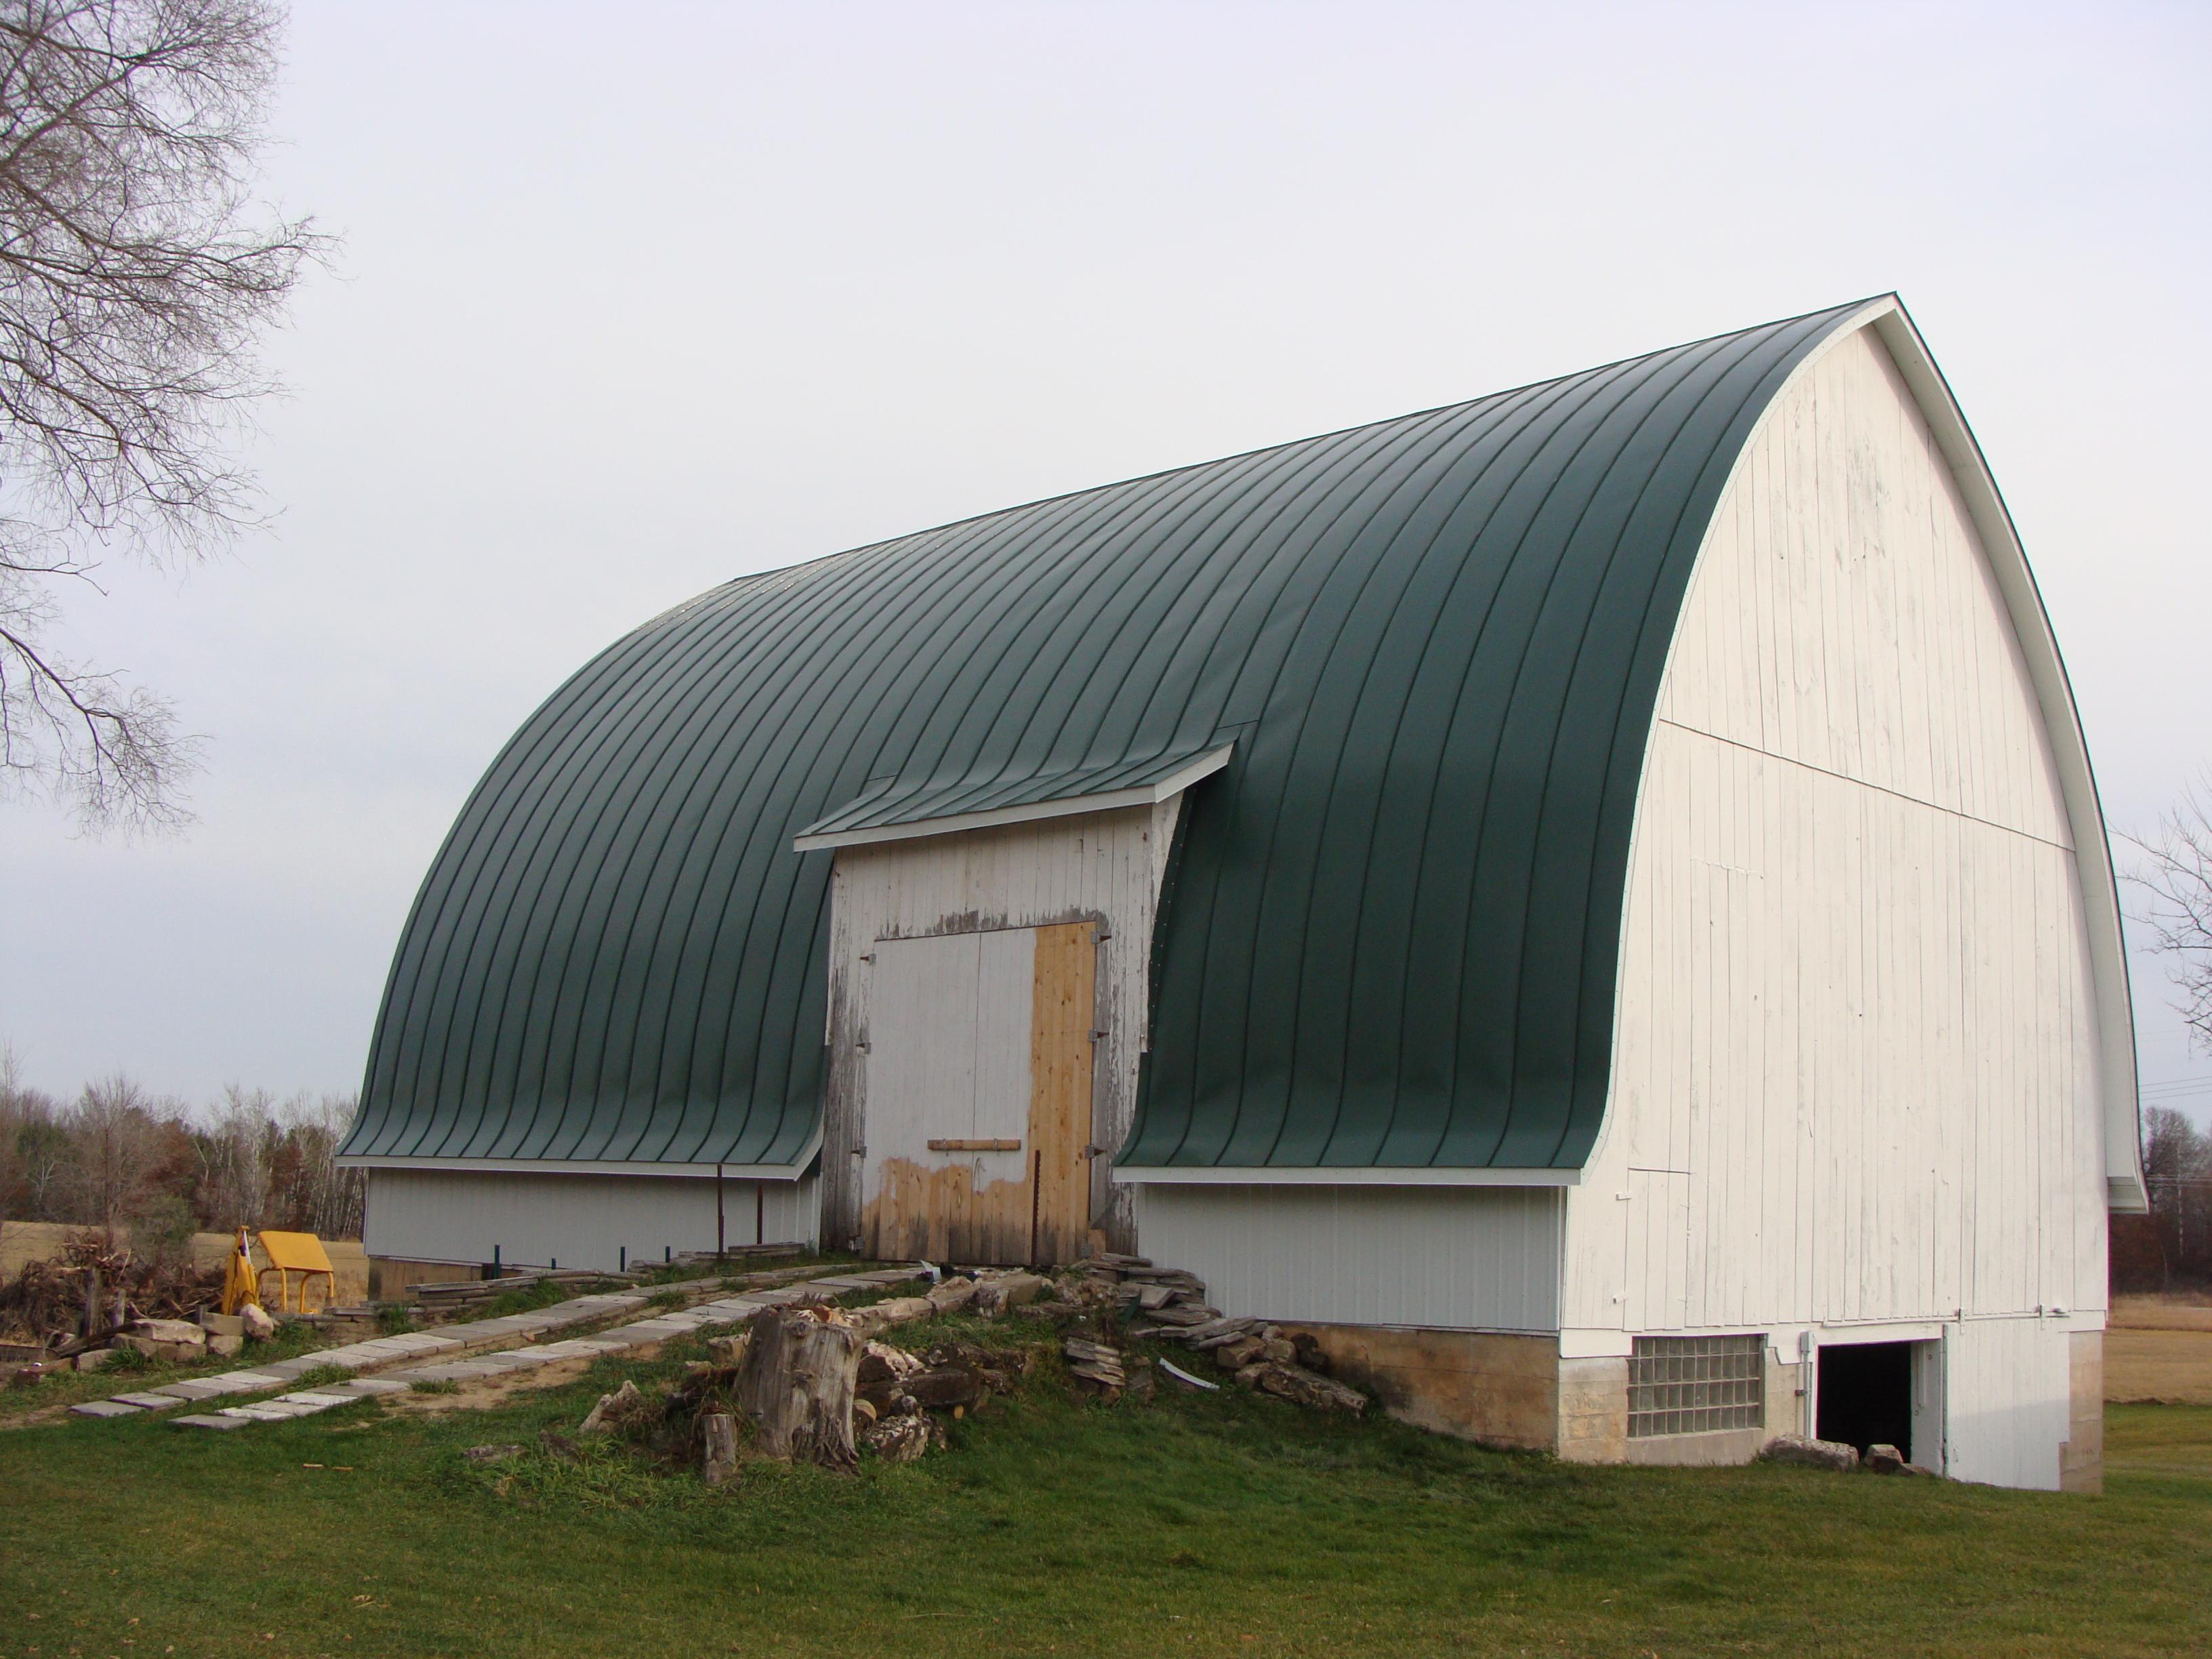 double lock sheet agricultural gothic barn standing seam metal roofing dark hartford green cupola culpitt wisconsin illinois north dakota iowa minnesota